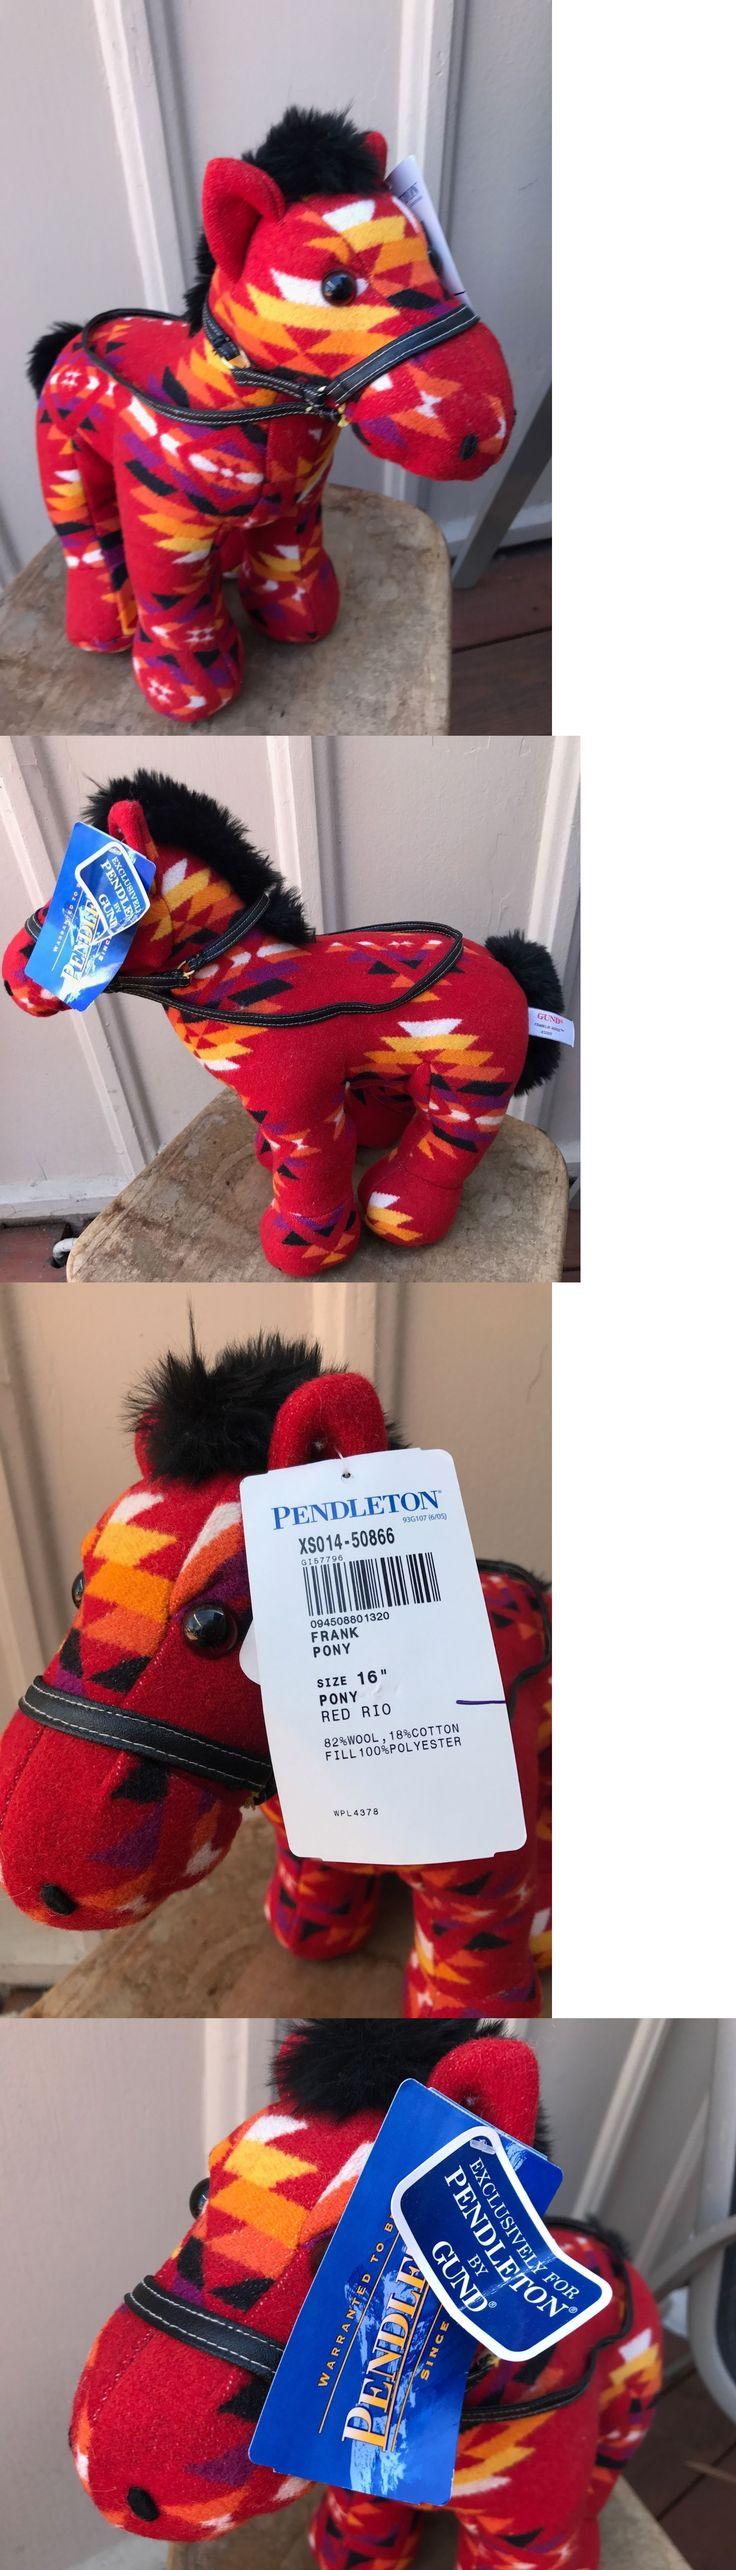 Gund 2598: Pendleton By Gund Frank Pony Stuffed Plush Horse Nwt Beautiful 16 Franklin -> BUY IT NOW ONLY: $150 on eBay!